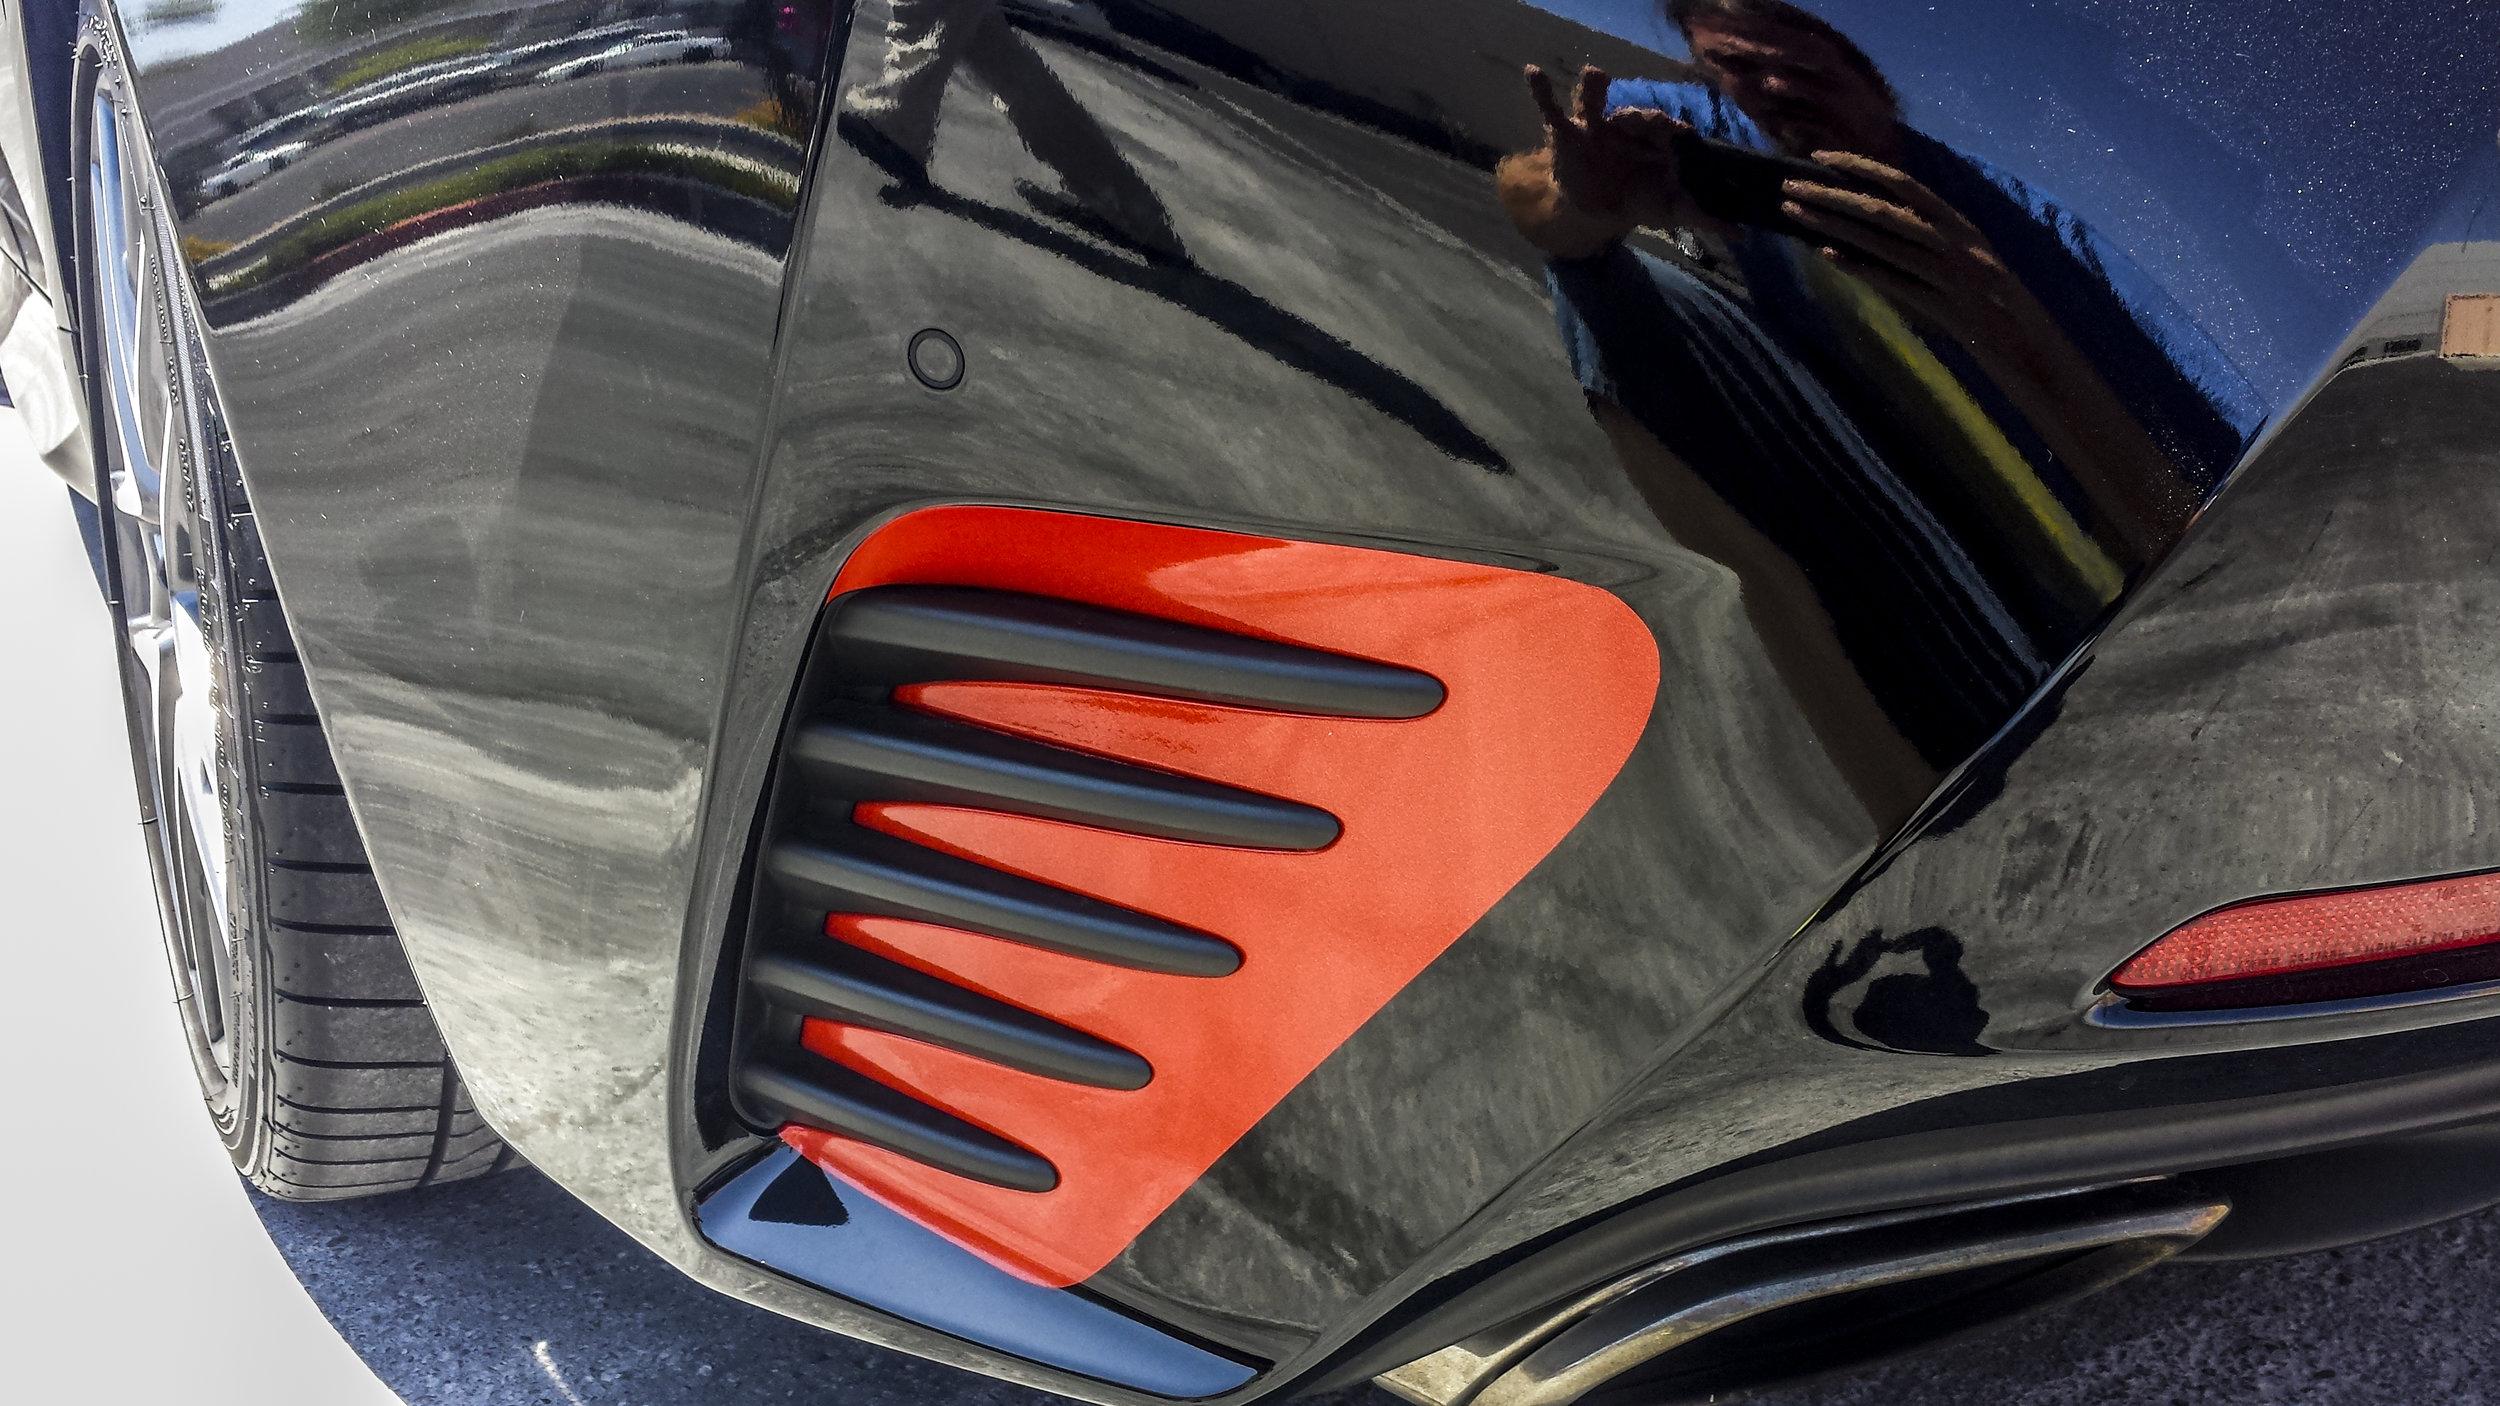 Lexus RC350 Red Orange Flake